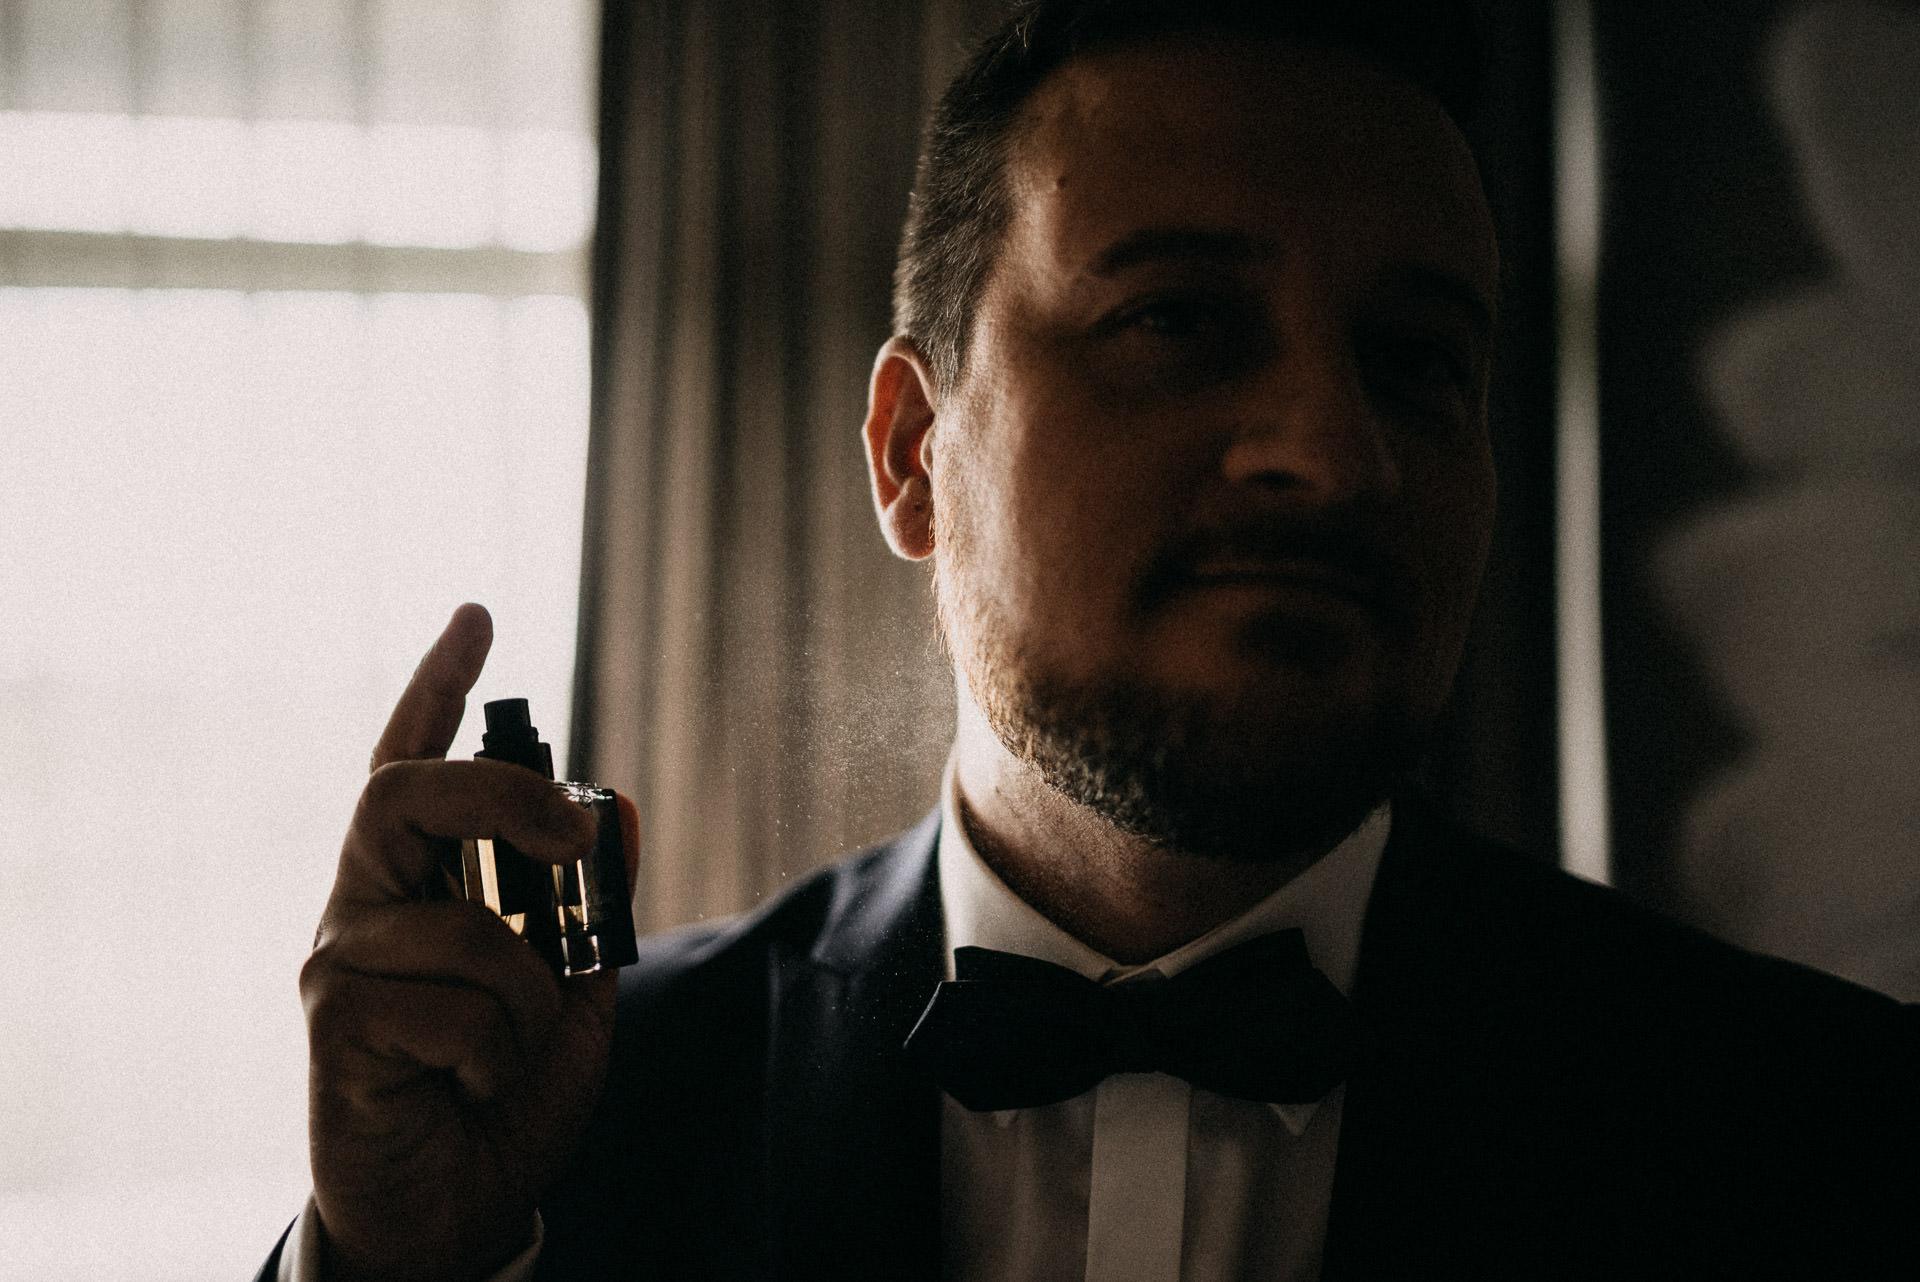 keszulodes volegeny parfum